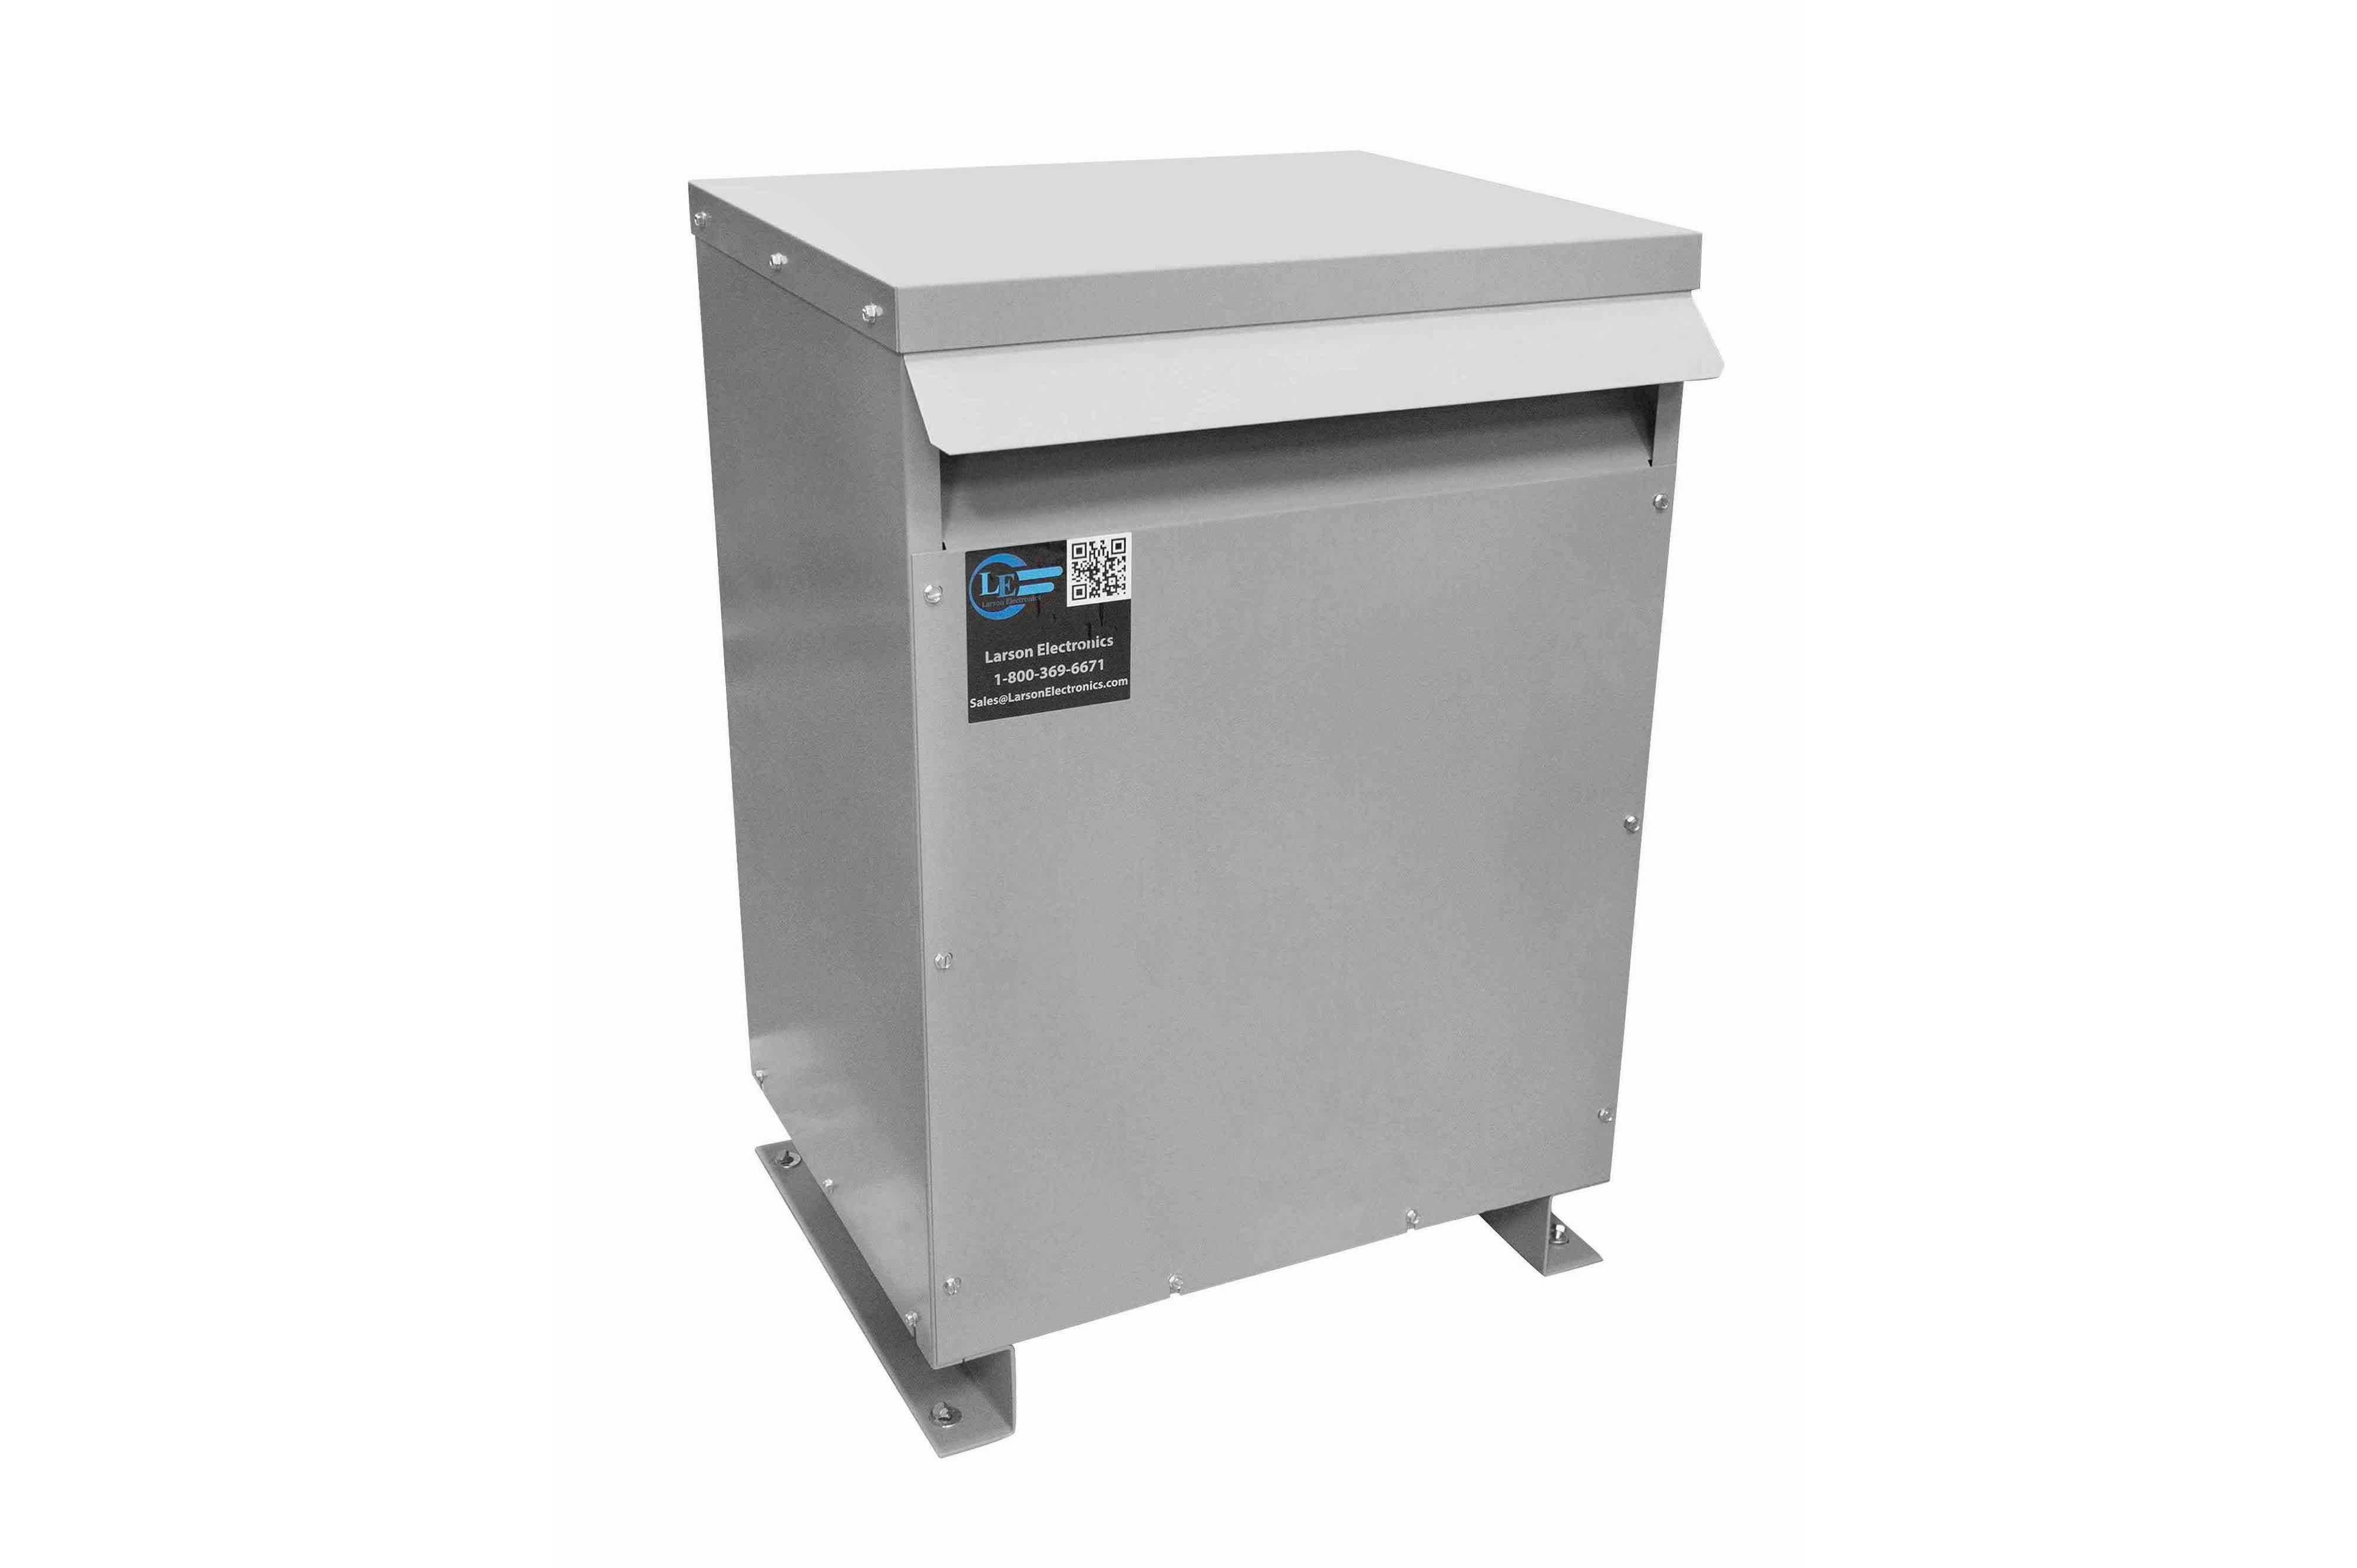 900 kVA 3PH Isolation Transformer, 480V Wye Primary, 380V Delta Secondary, N3R, Ventilated, 60 Hz